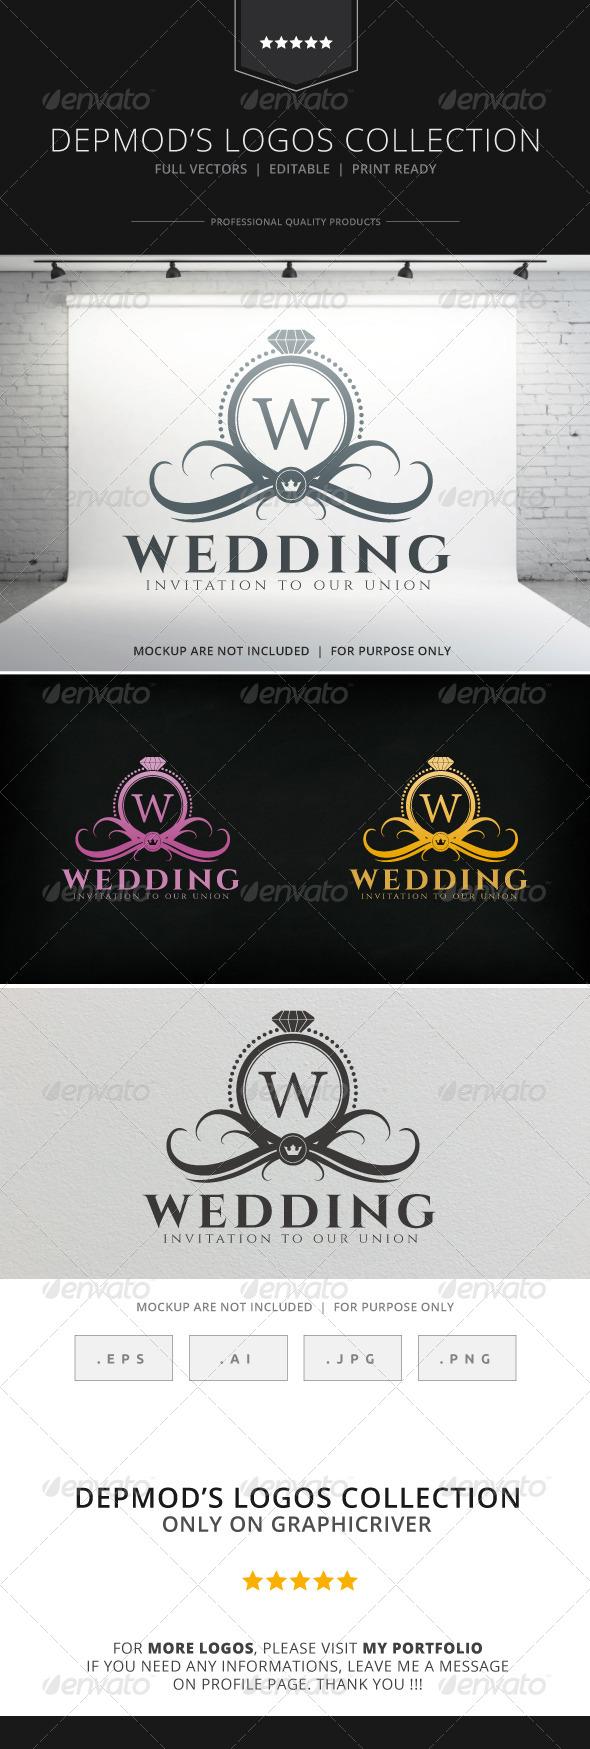 Matrimony Graphics, Designs & Templates from GraphicRiver